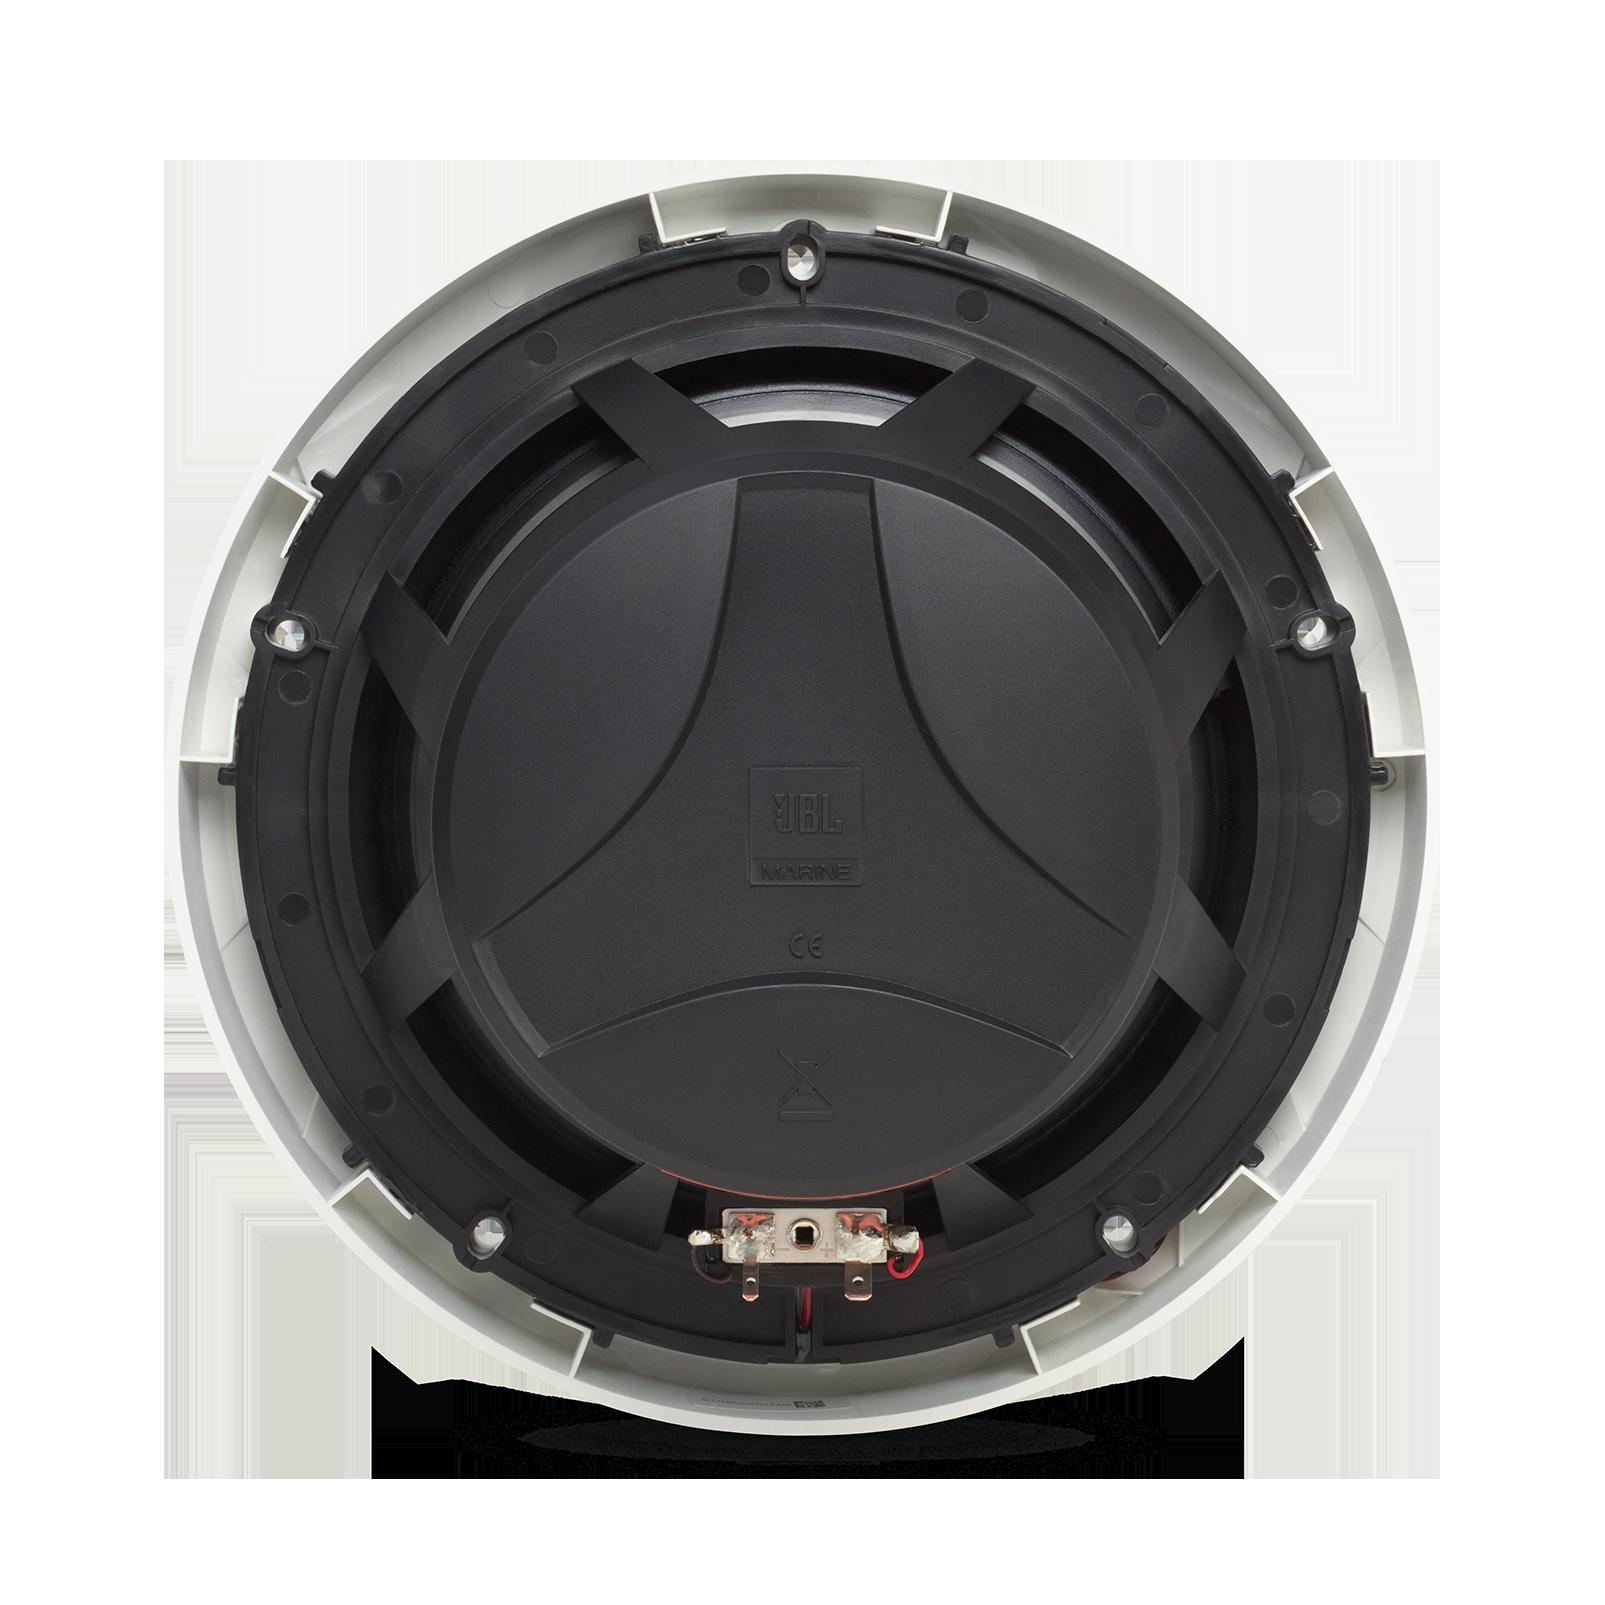 "Club Marine MS8LW - White Gloss - Club Marine MS8LW—8"" (200mm) two-way marine audio multi-element speaker with RGB lighting – White - Back"